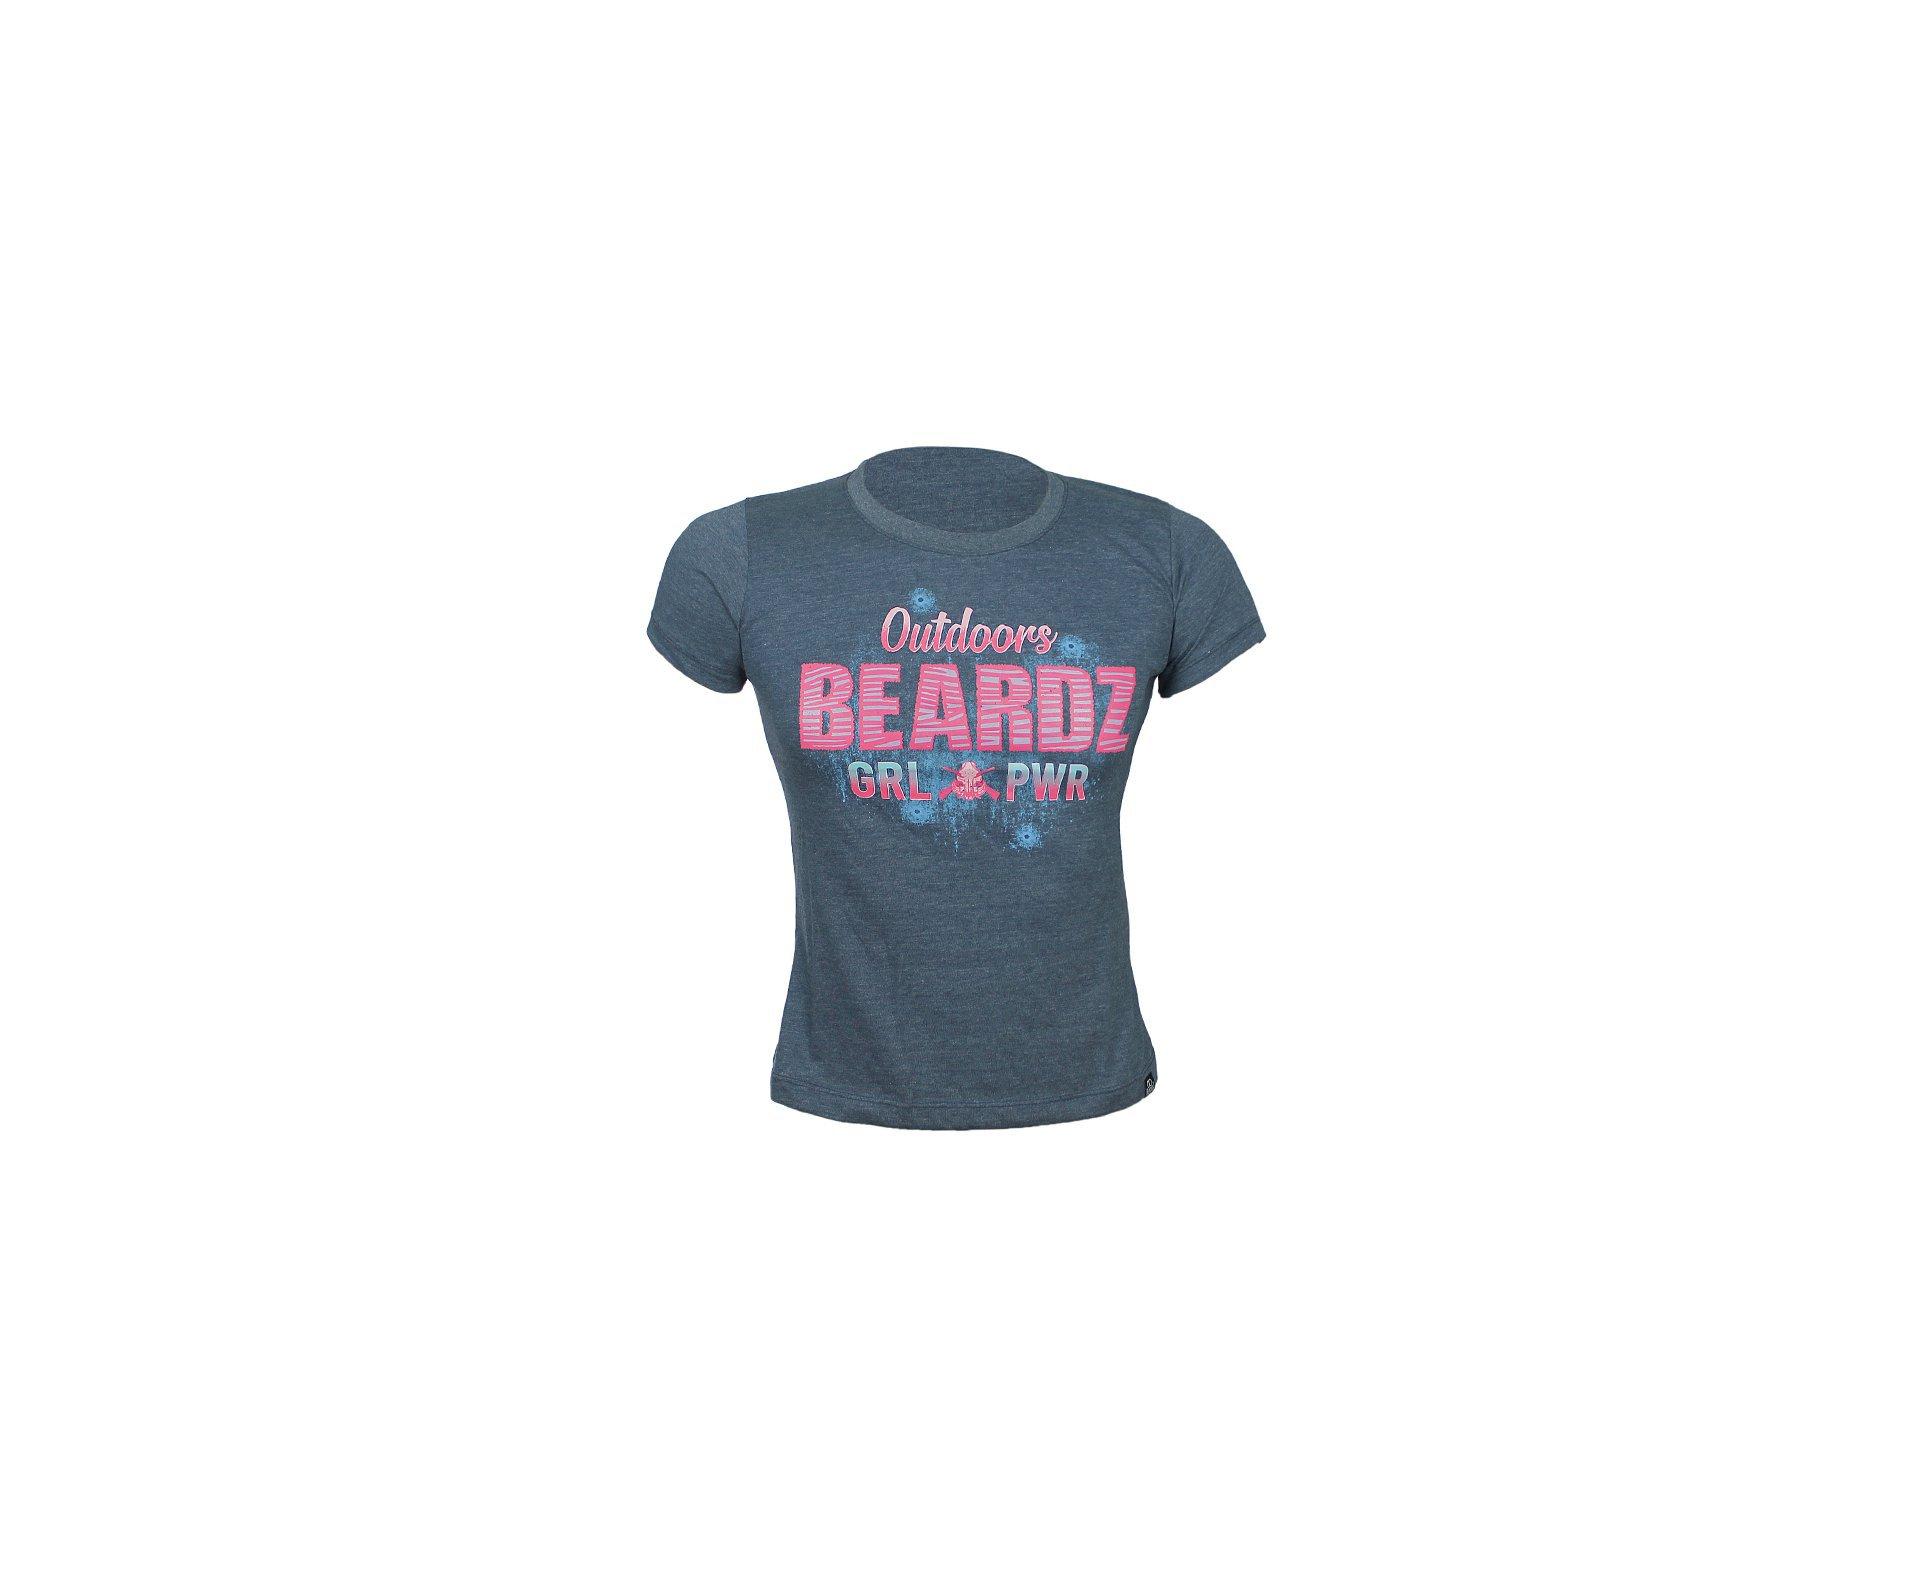 Camiseta Feminina Beardz Grl Pwr Girl Powerts12